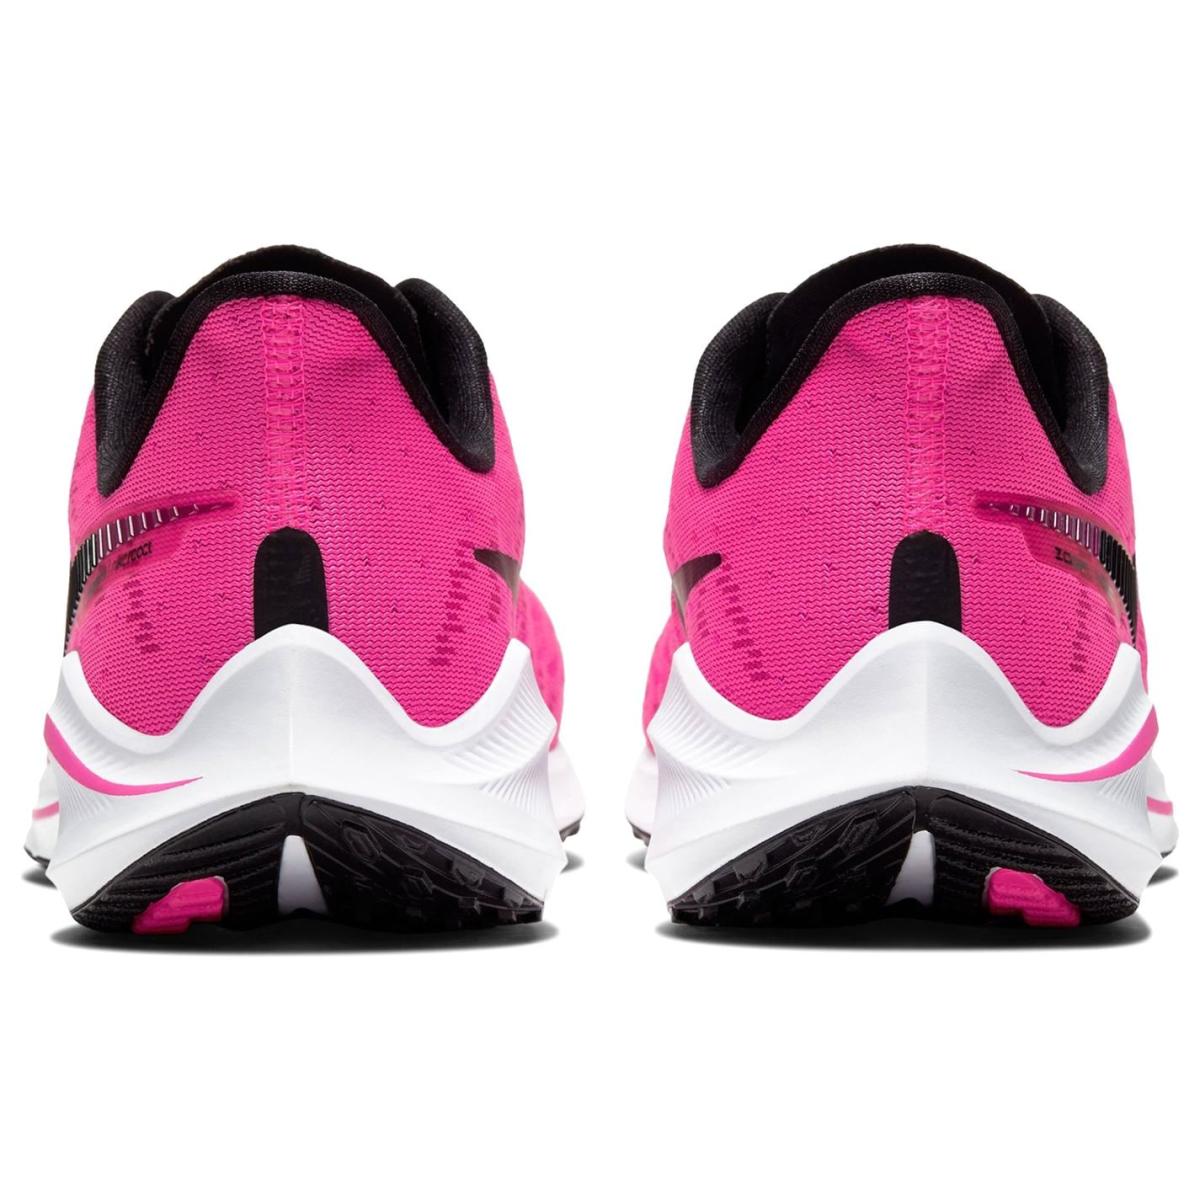 Nike Zoom Vomero 14 Turnschuhe Damen Sneaker Sportschuhe Laufschuhe 4921